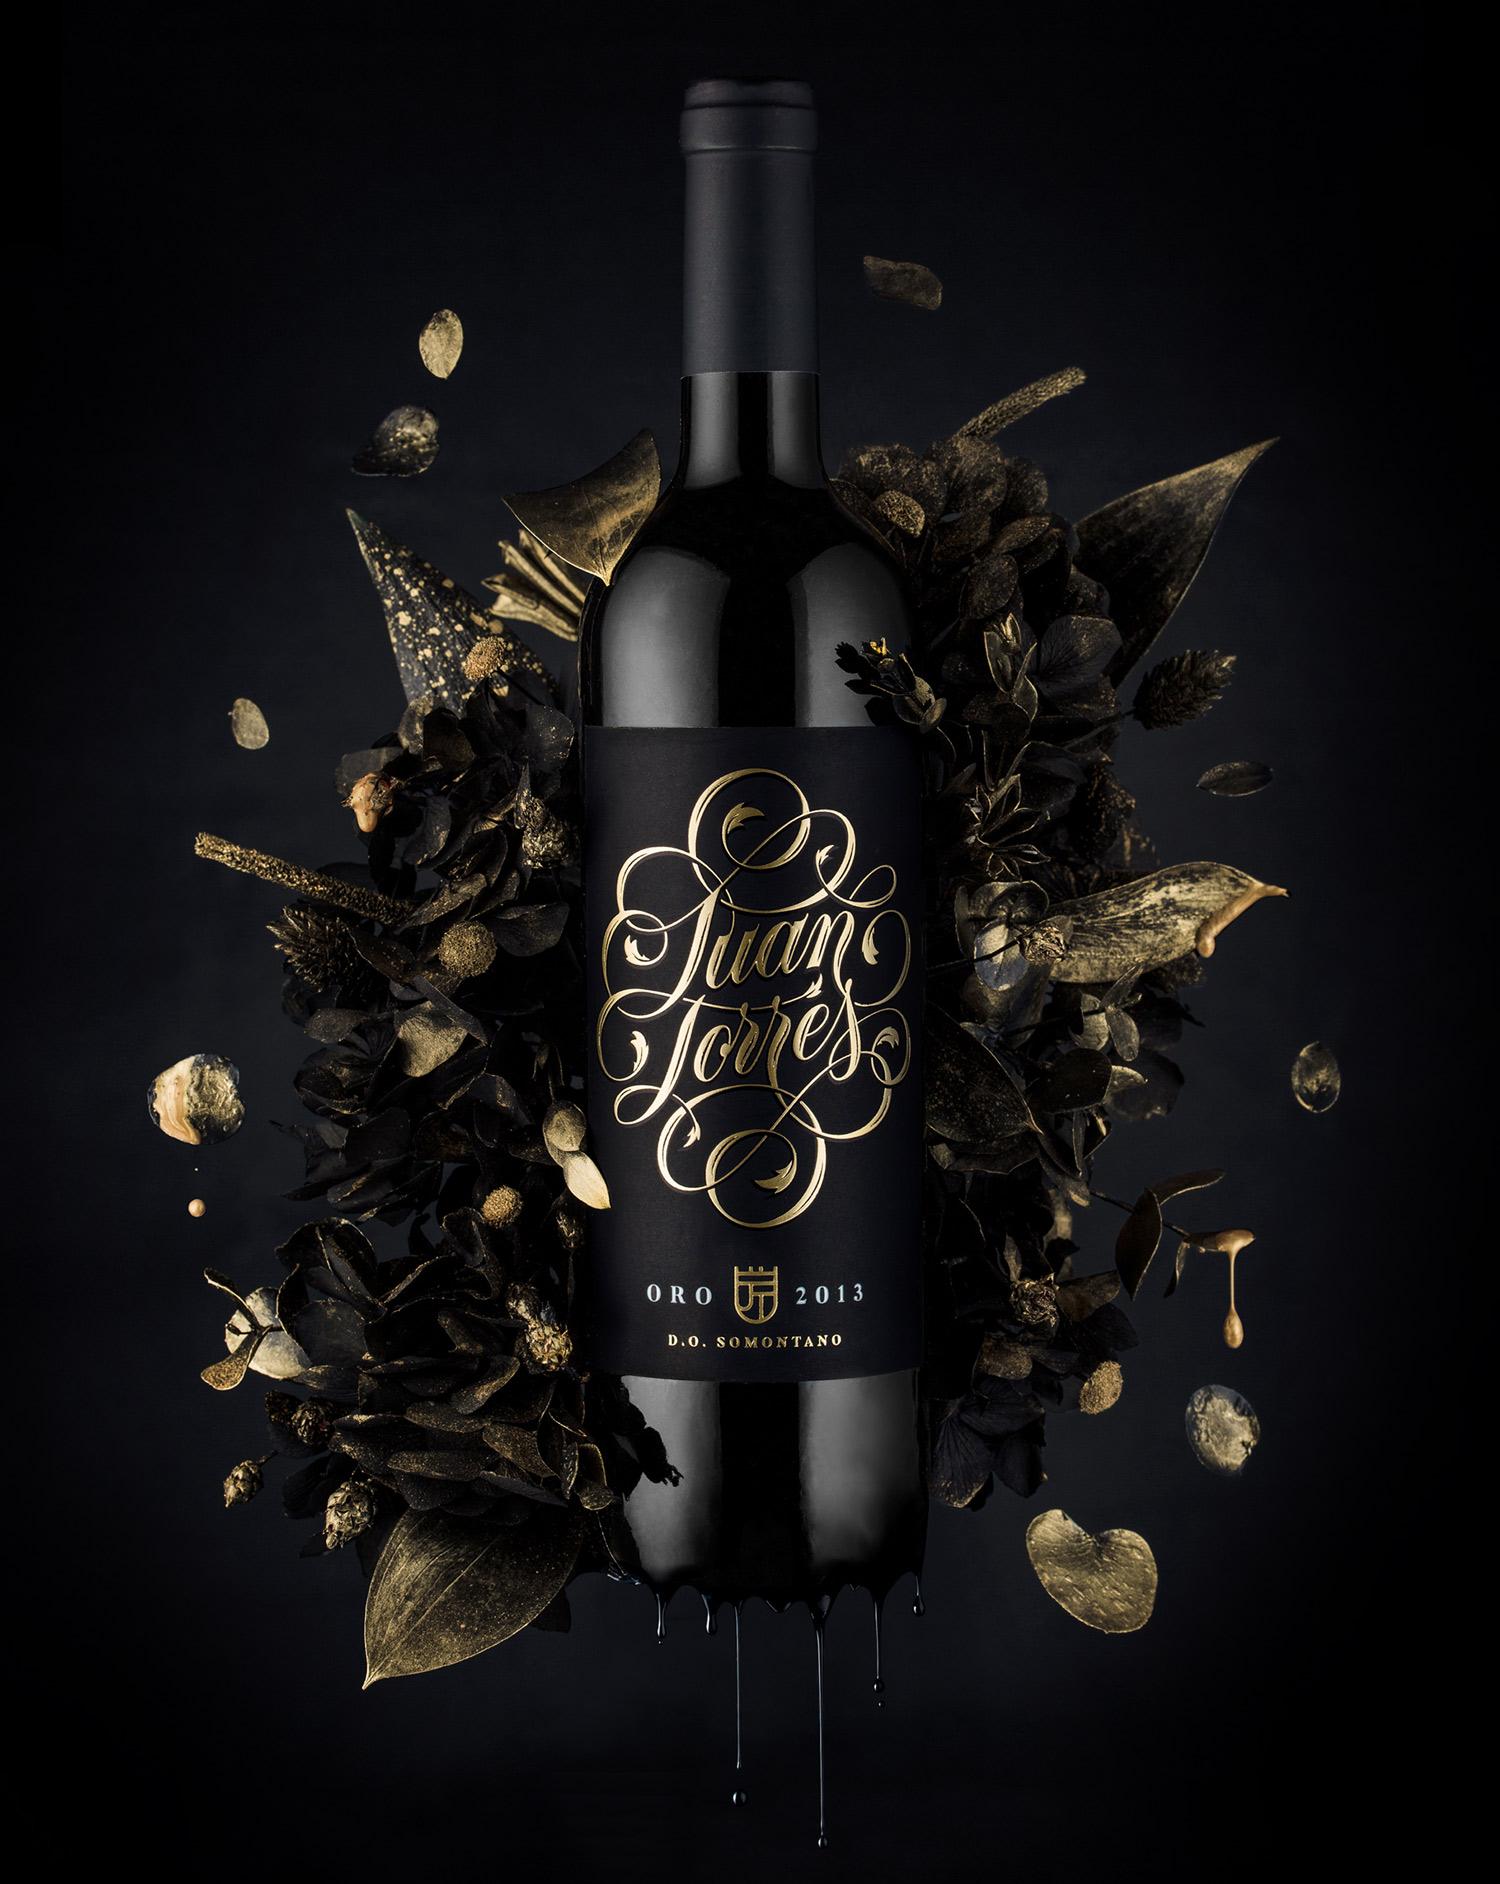 juan-torres-siroko-packaging-vino-etiqueta-06